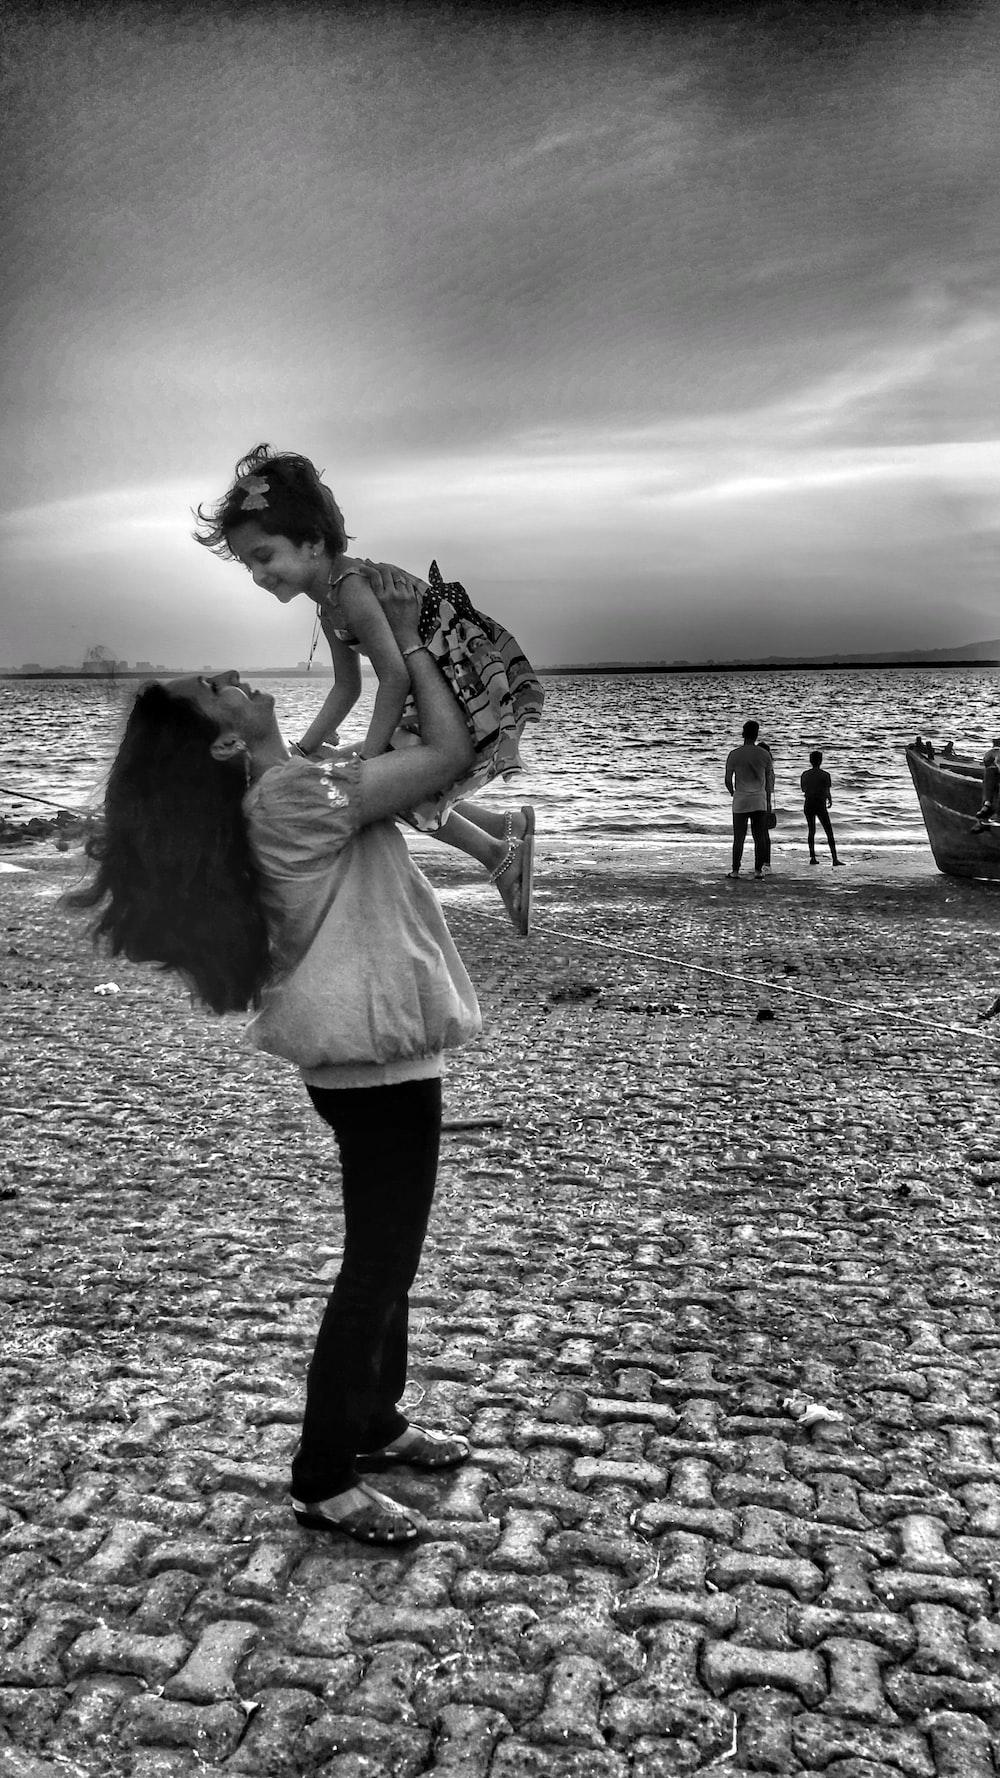 woman carrying girl